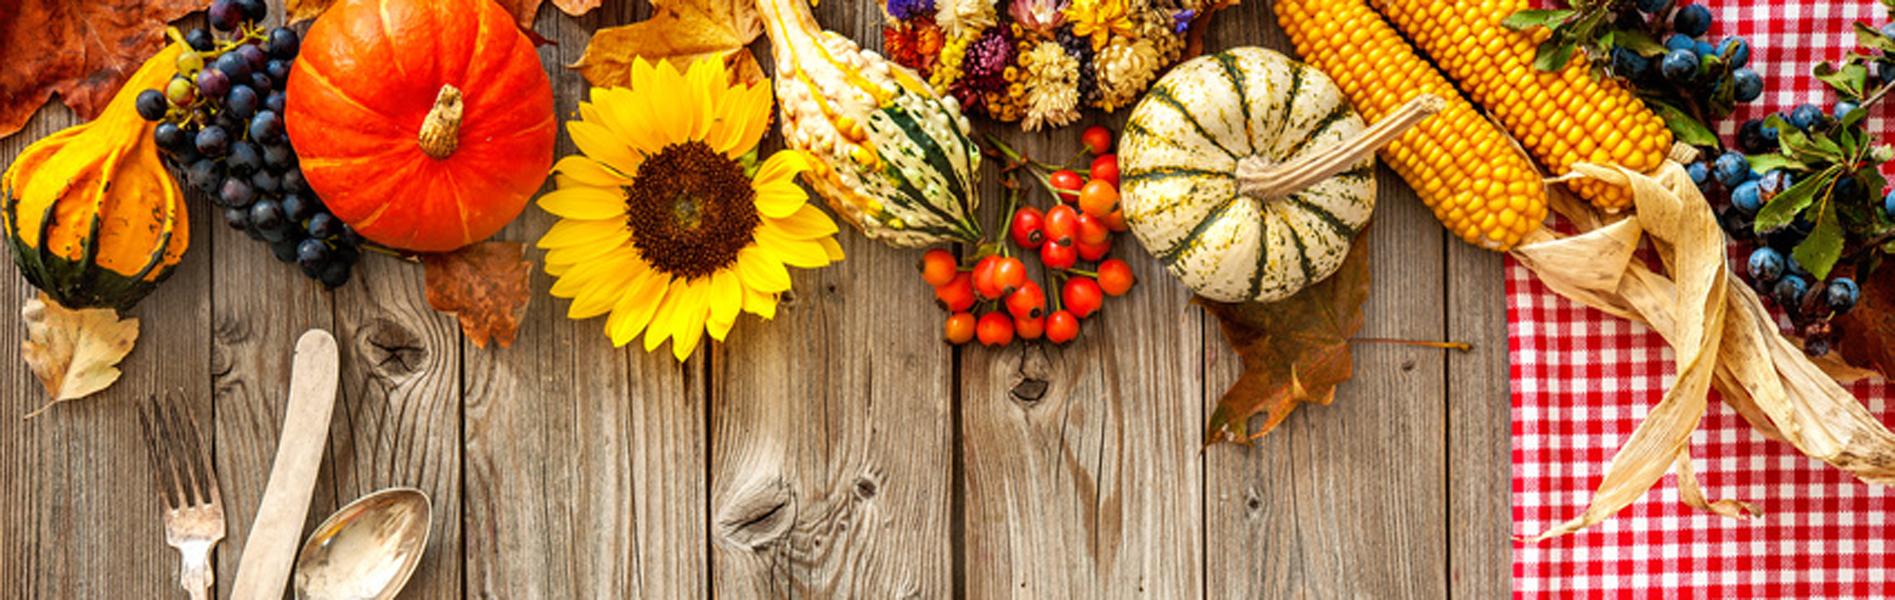 Saisonales - Herbst